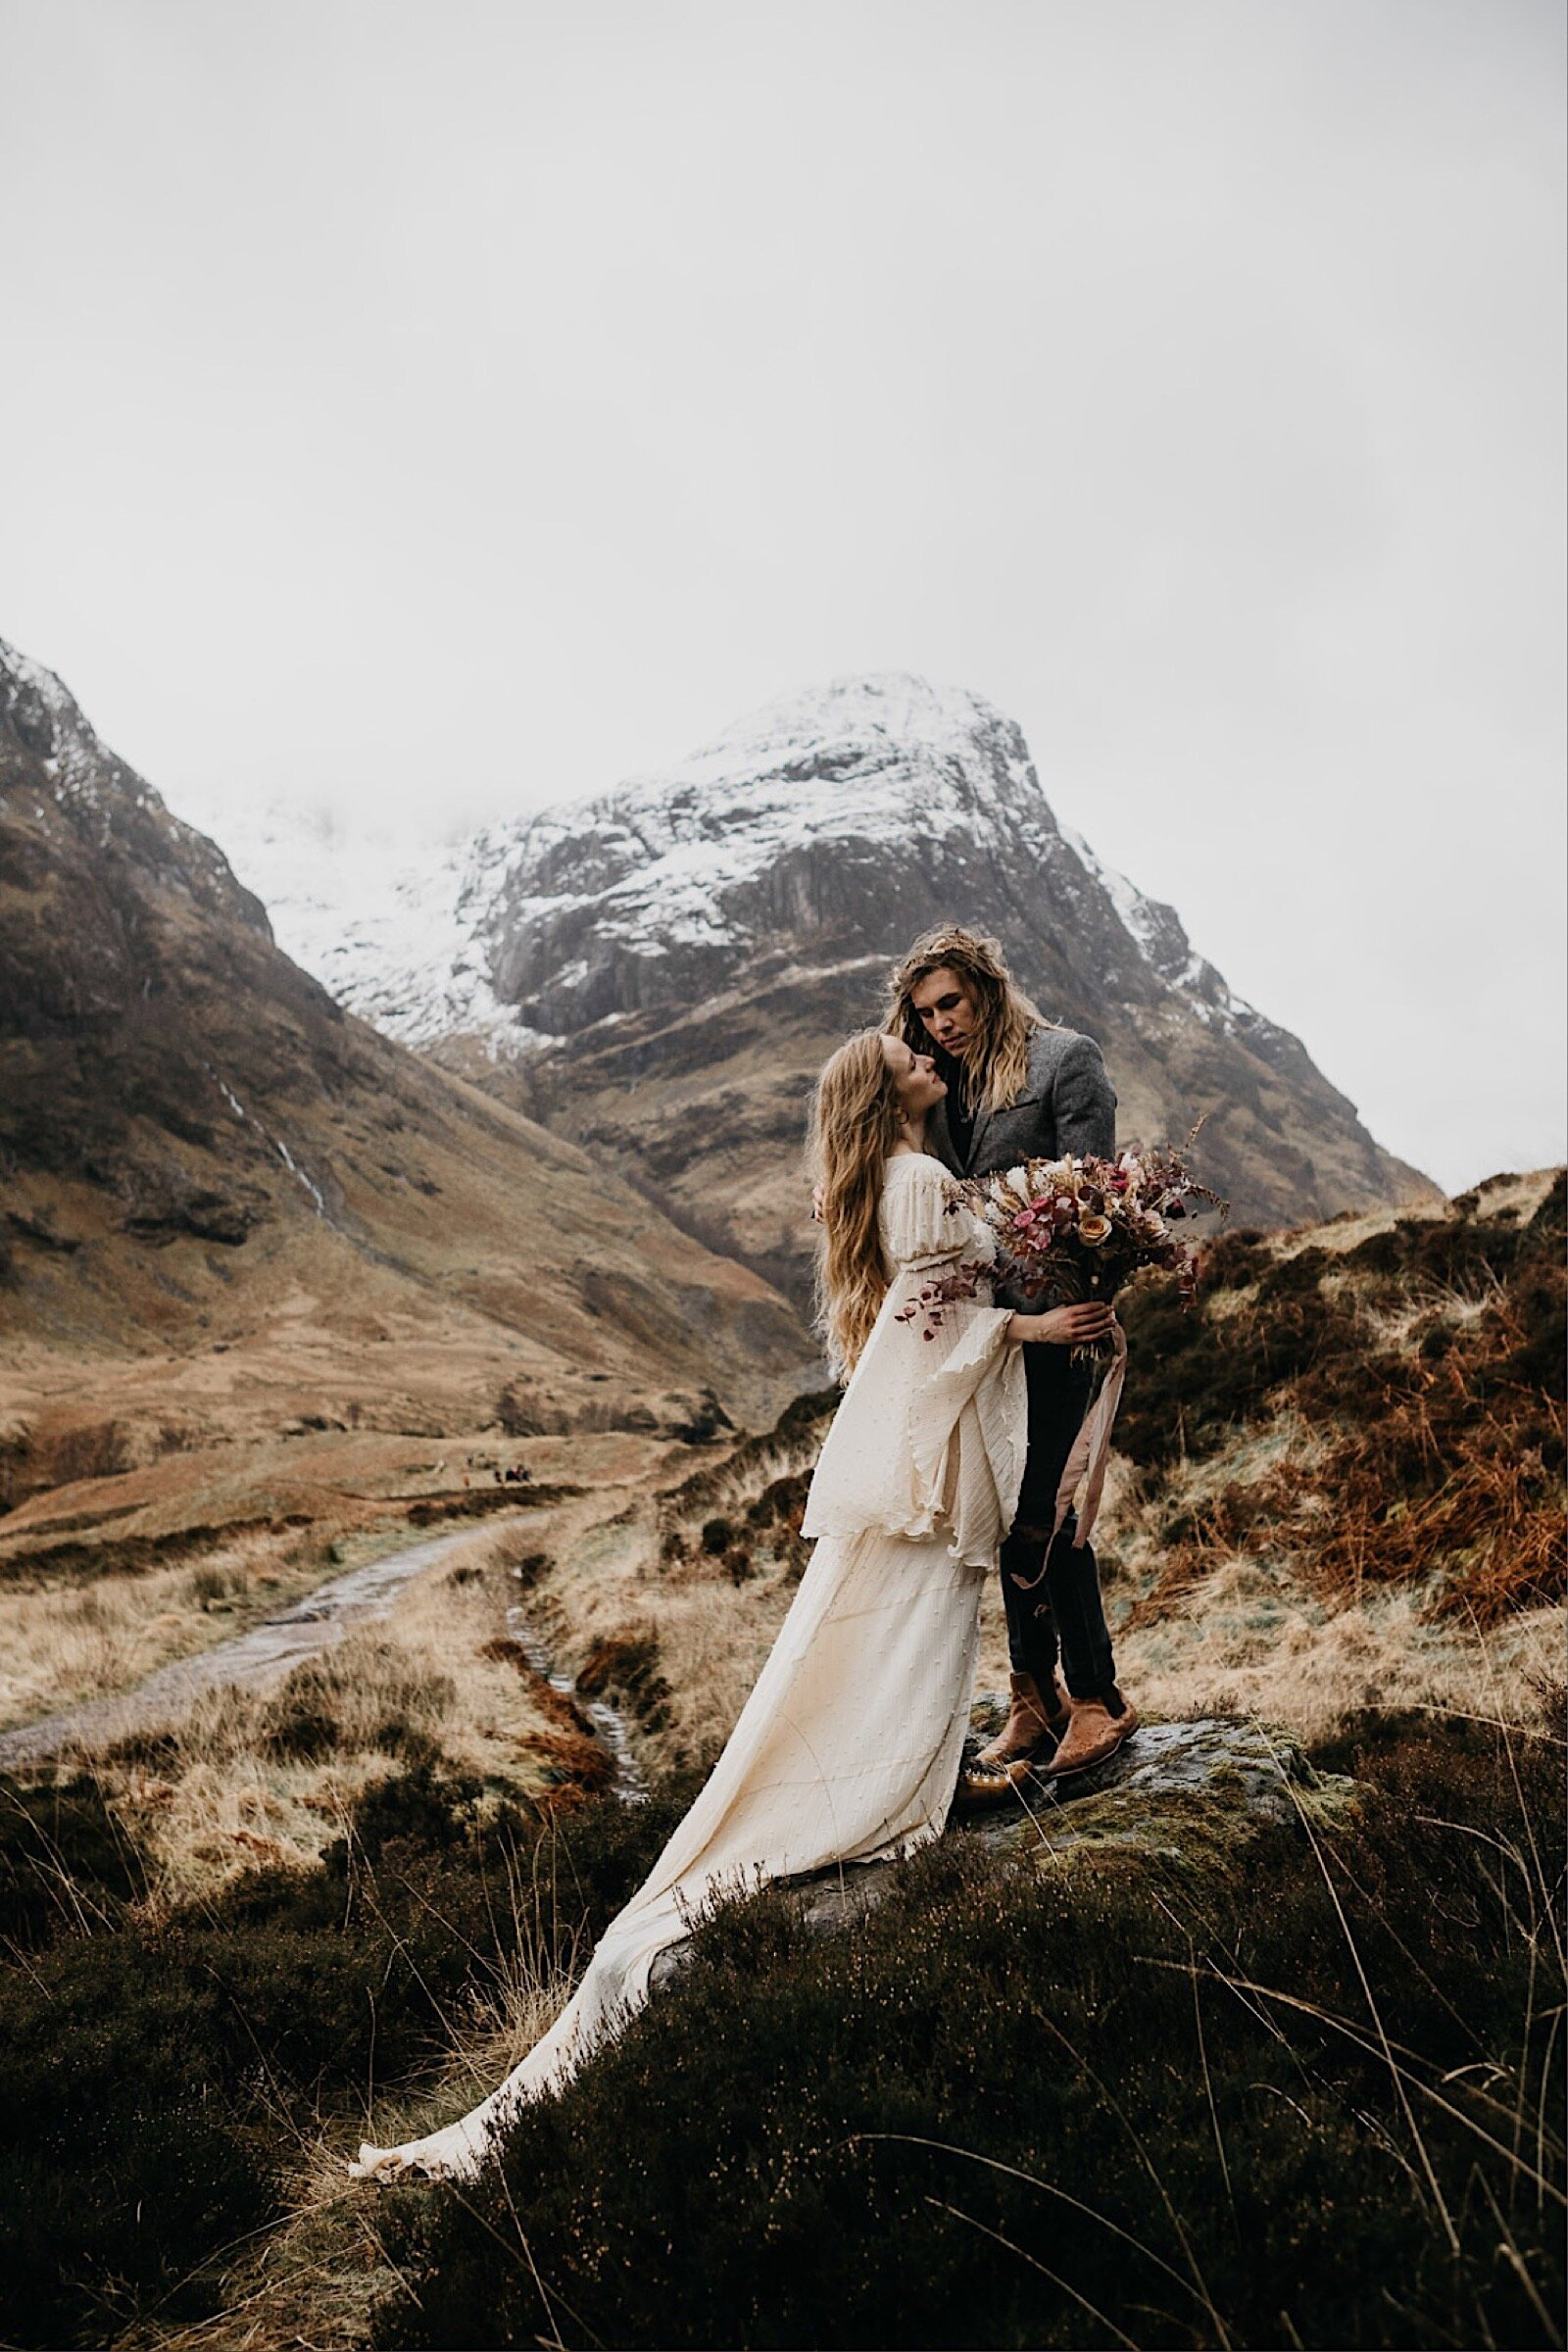 06_scotland_couple_shoot_lety_photography (28 von 39).jpg